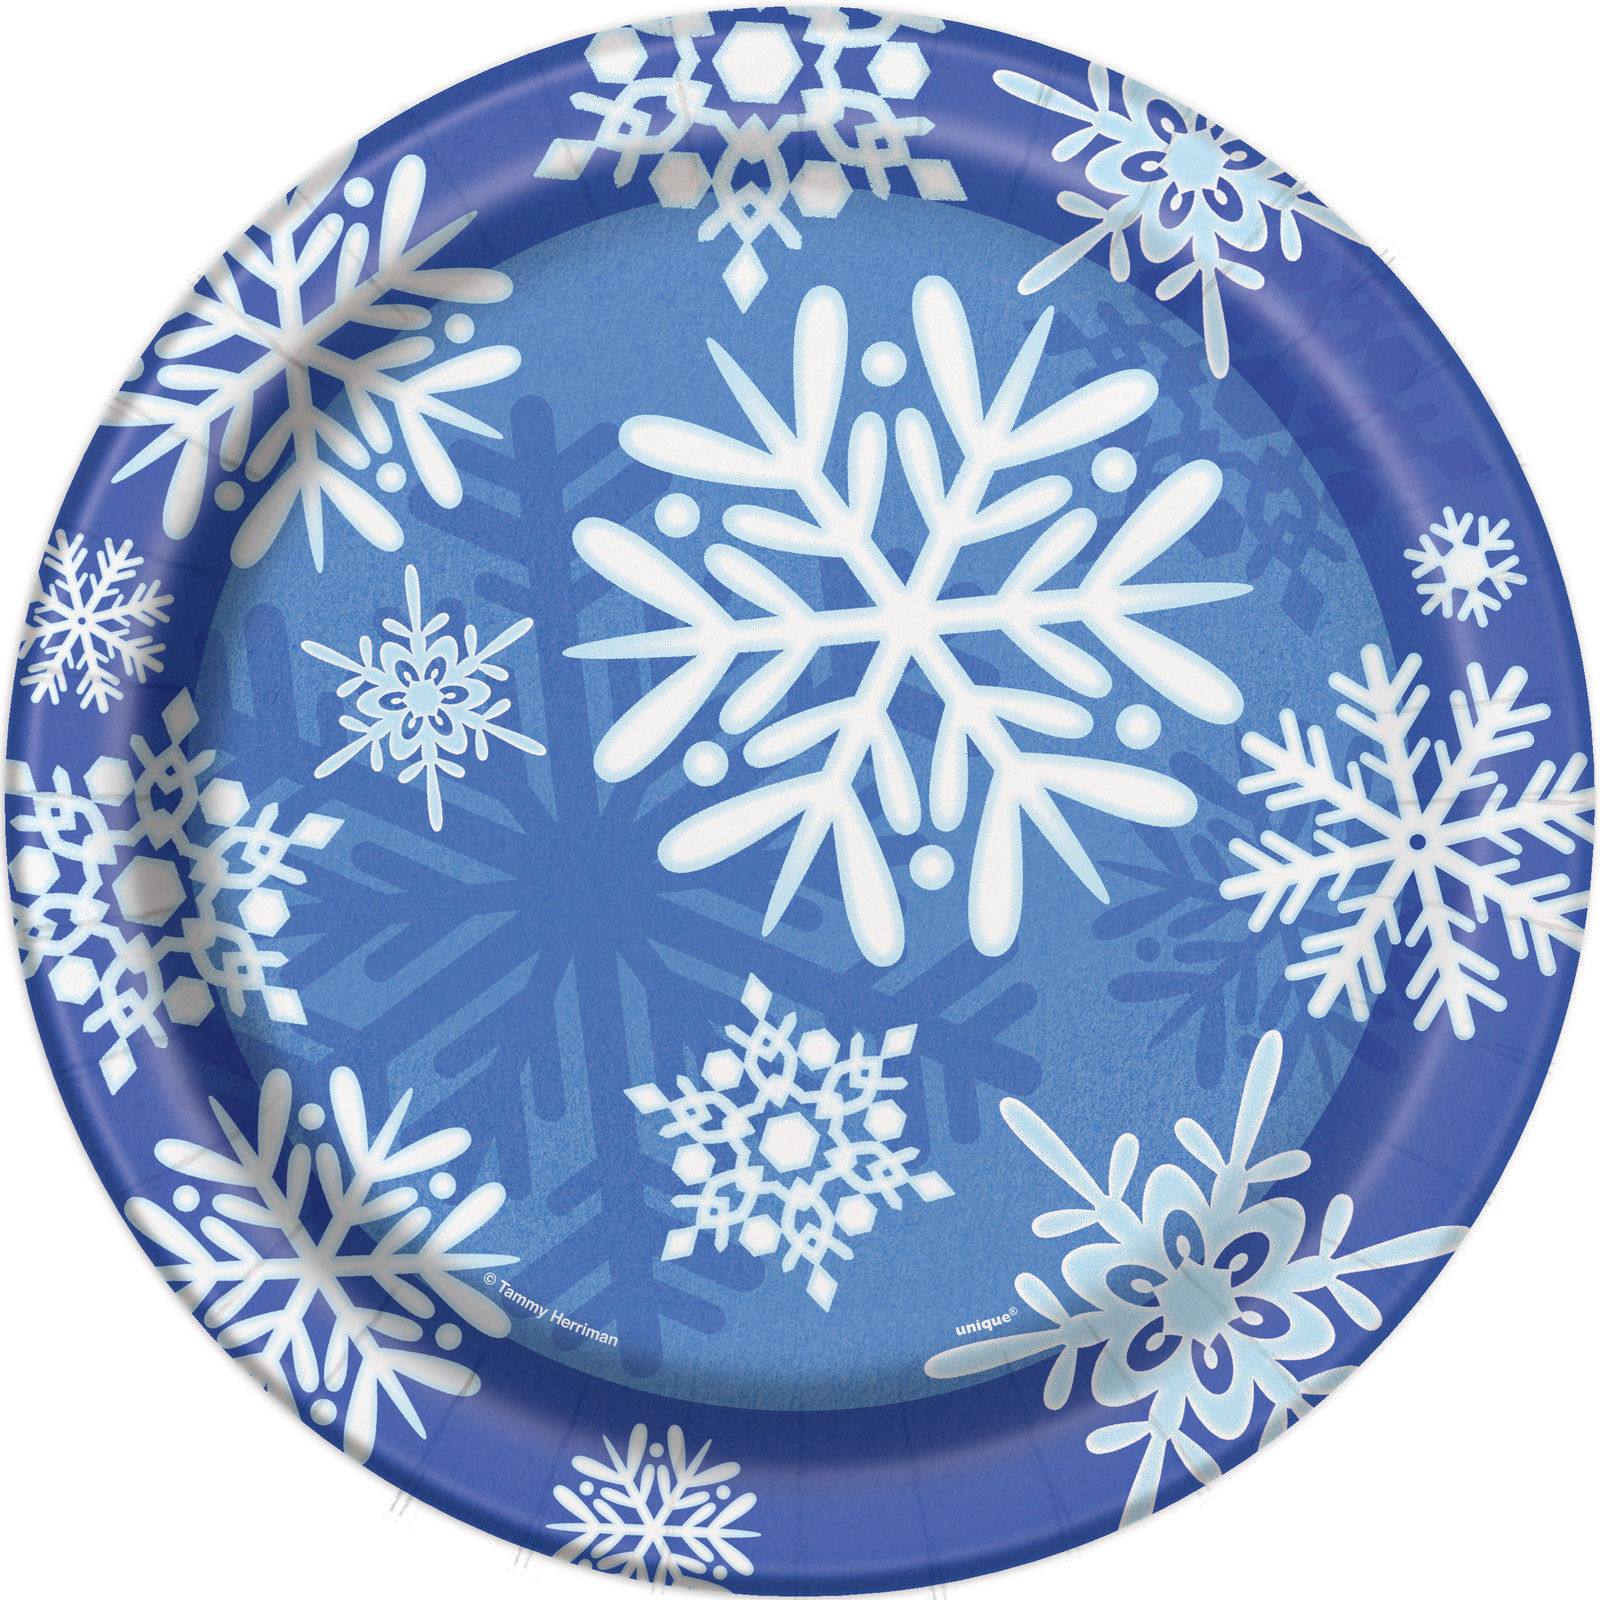 8 x Blue u0026 White Frozen Snowflakes Paper Plates 9  sc 1 st  eBay & 8 x Blue u0026 White Frozen Snowflakes Paper Plates 9